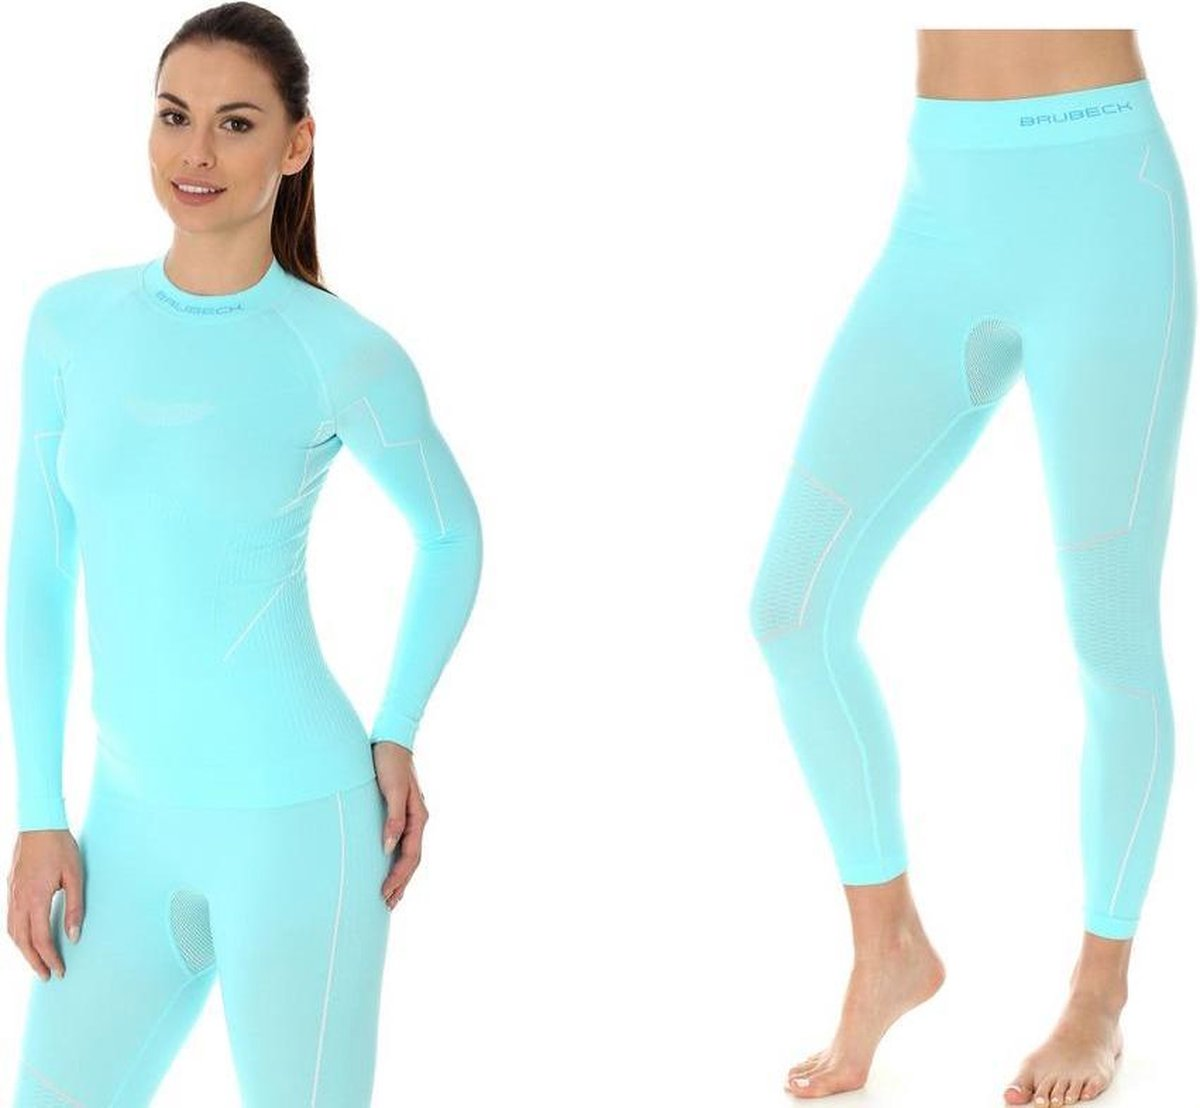 Brubeck | Dames Thermo Set - Thermokleding - met Nilit® Innergy - Lichtblauw - M